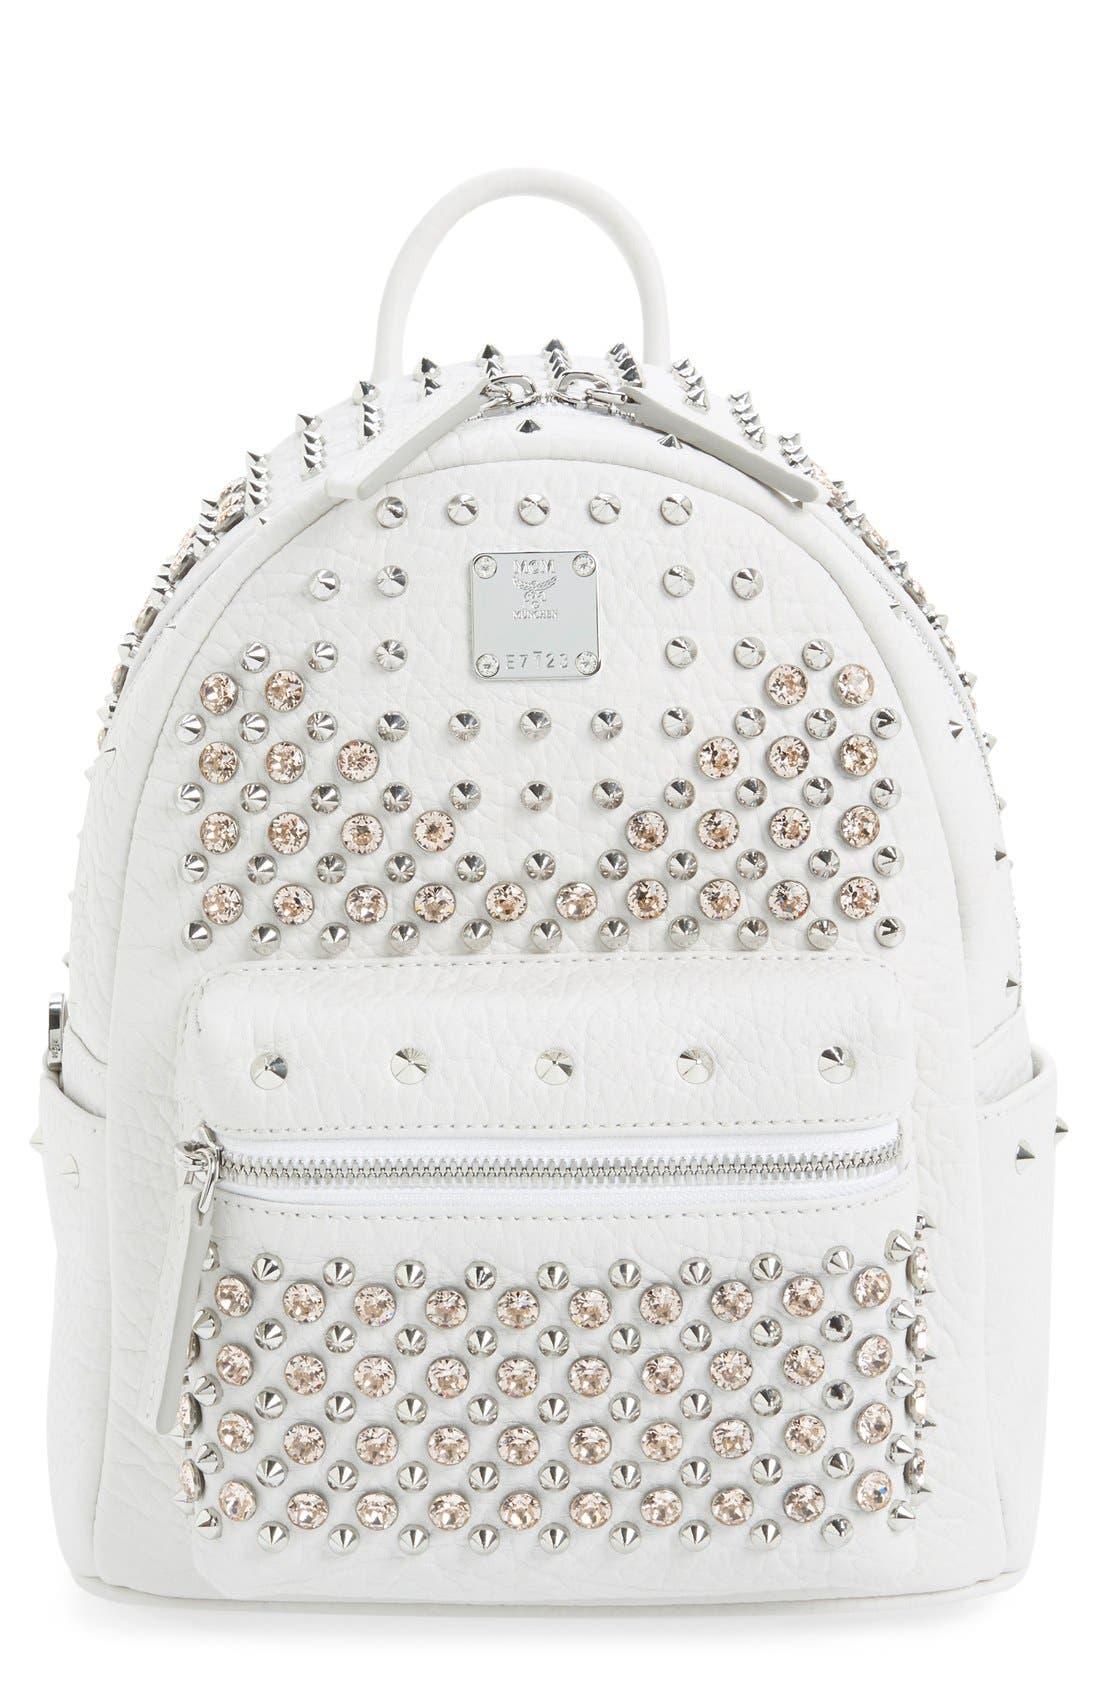 Alternate Image 1 Selected - MCM 'Mini Stark Special' Backpack